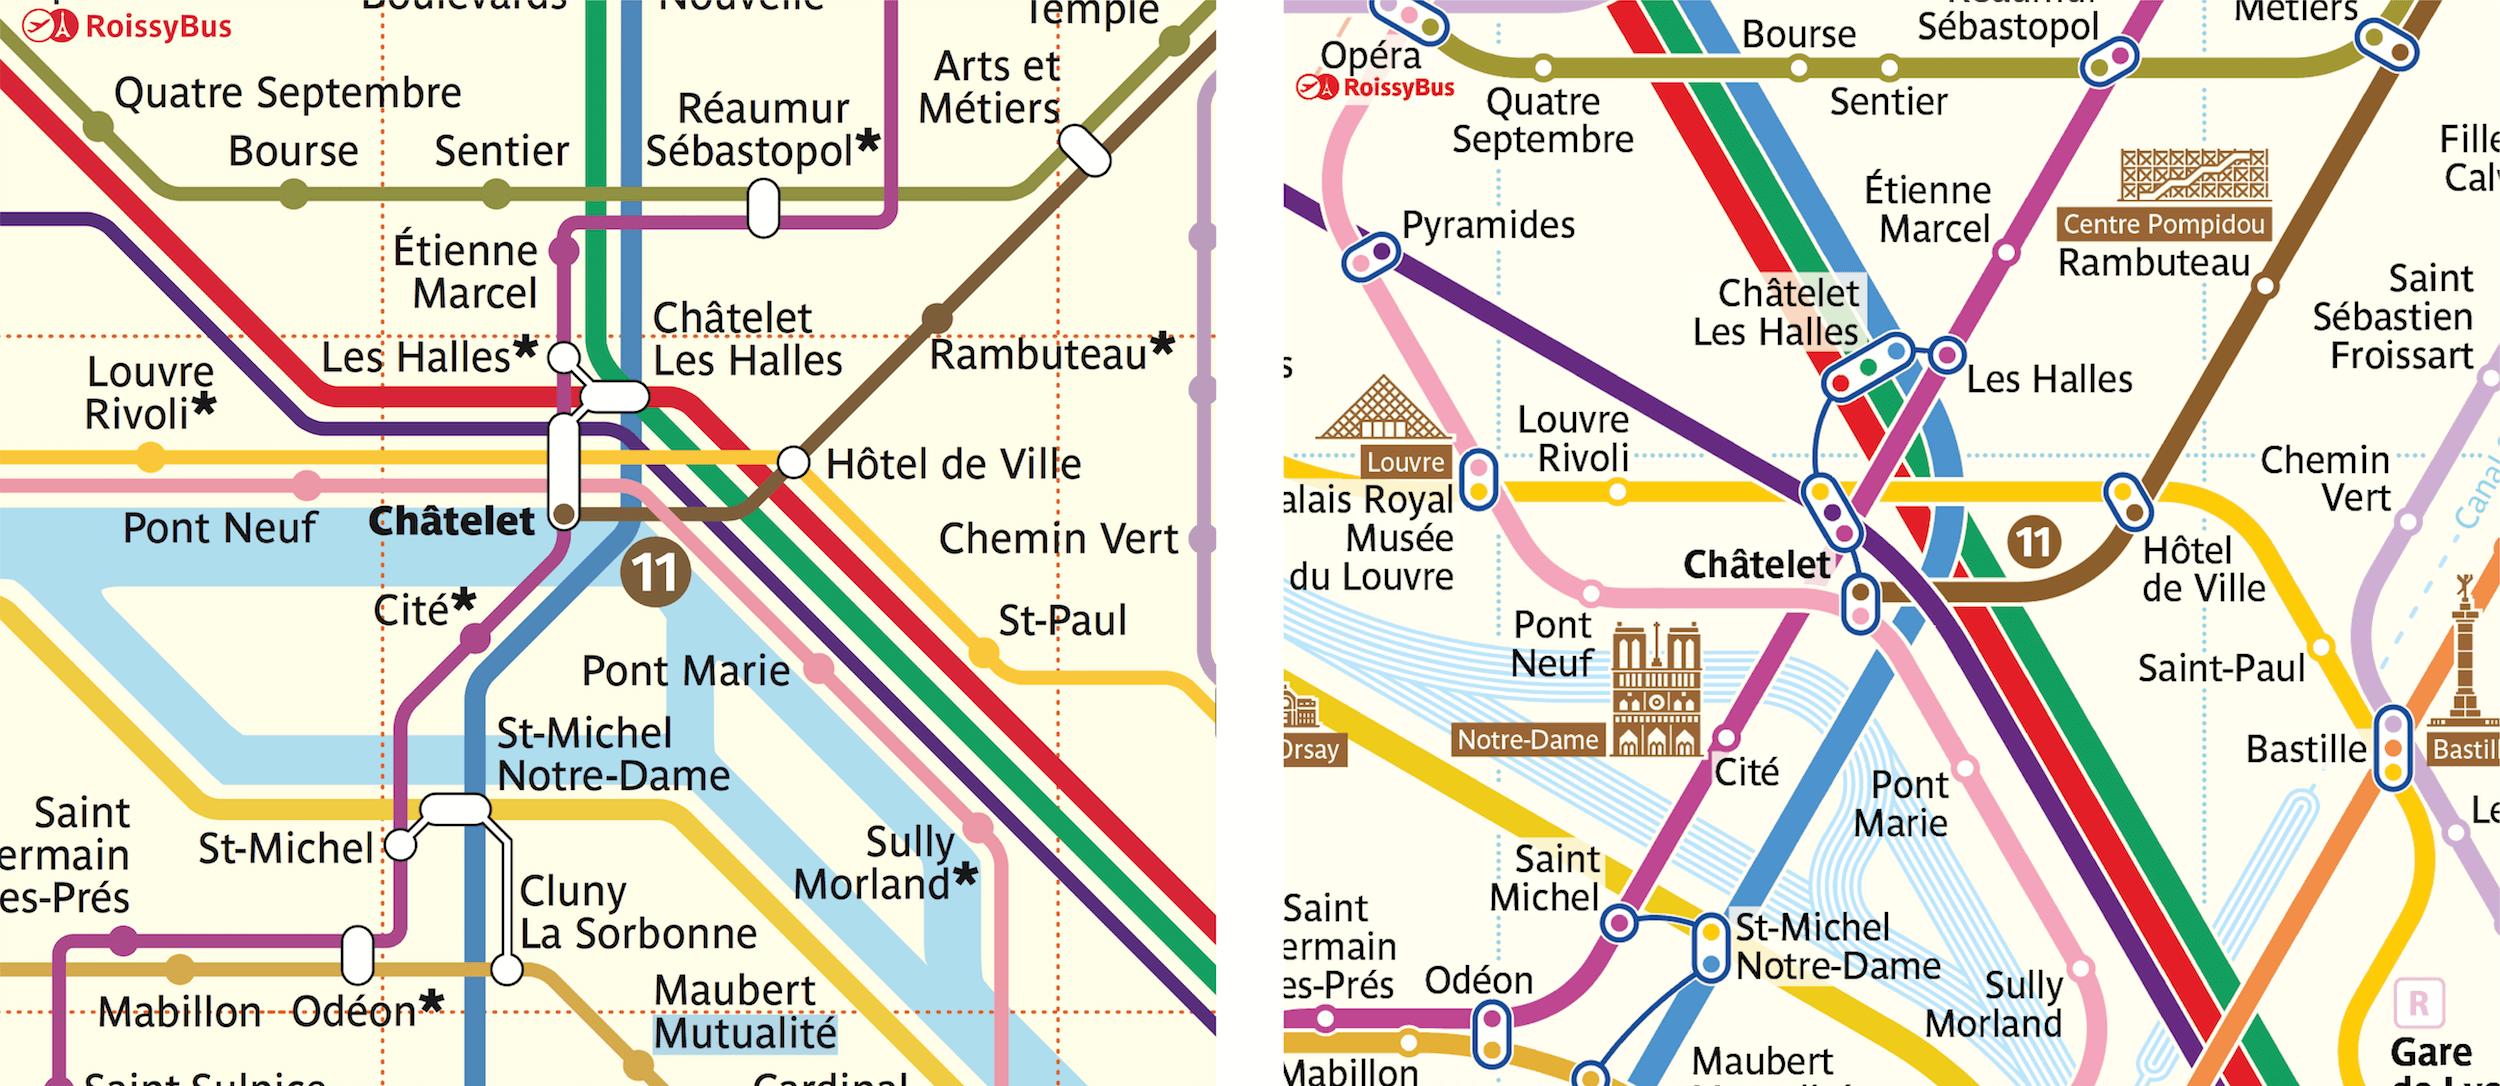 Arkham Knight Subway Map Freeze.Paris Metro Map The Redesign Smashing Magazine